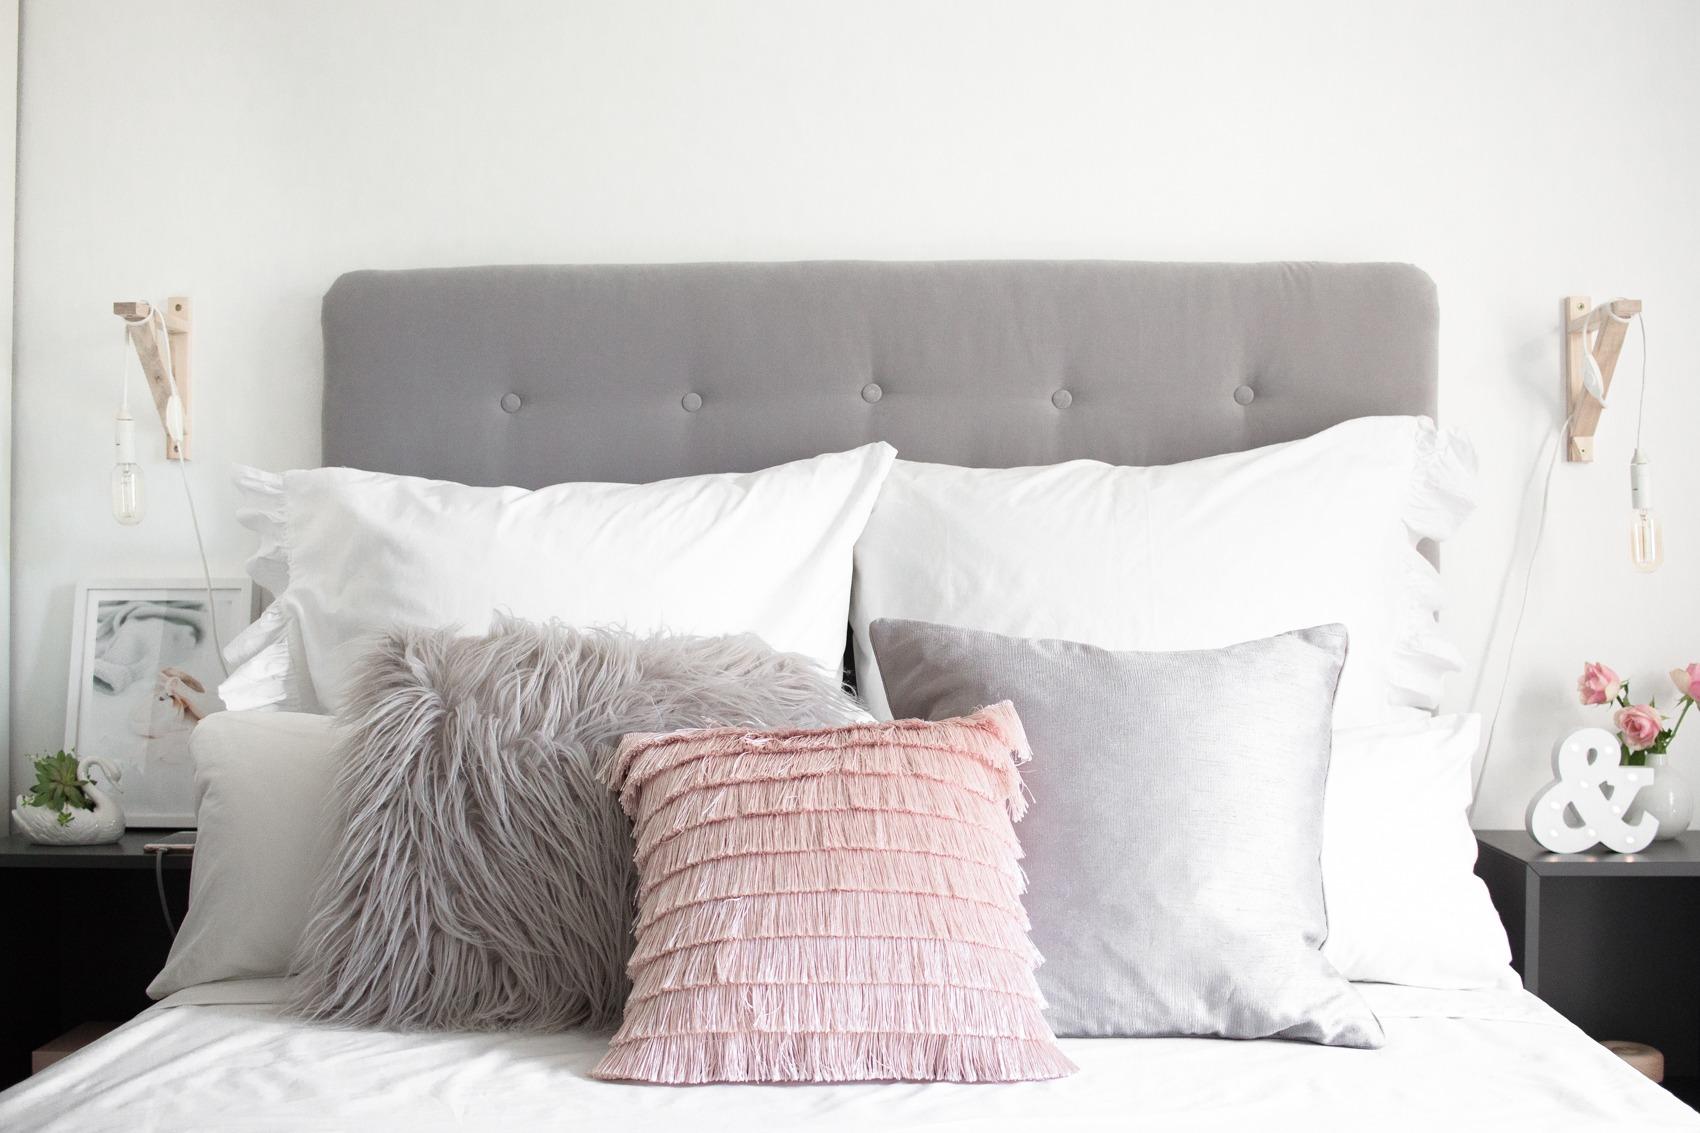 Diy Kopfteil Bett Selfmade Grau Samt Chesterfield Look 26 Puppenzirkus